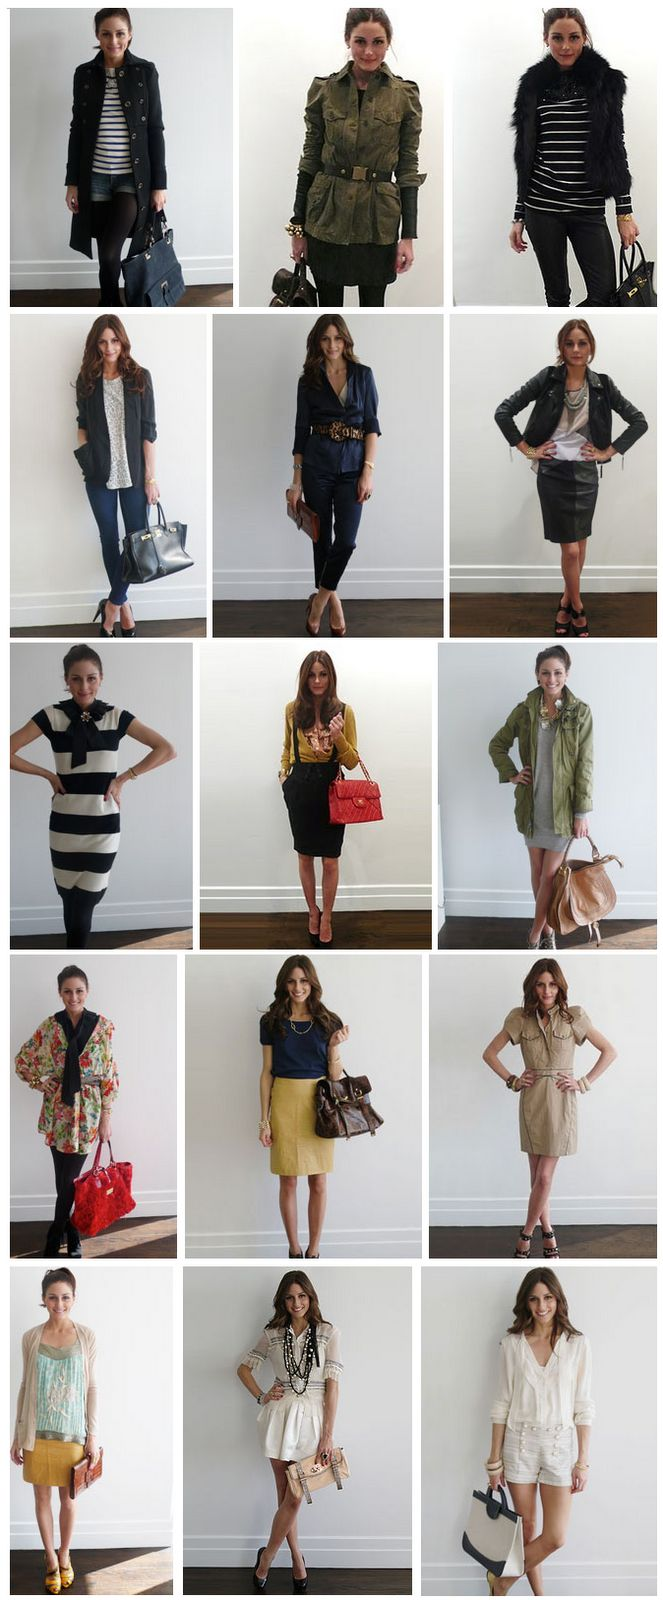 The Olivia Palermo Lookbook : Olivia Palermo: Style Spotlight